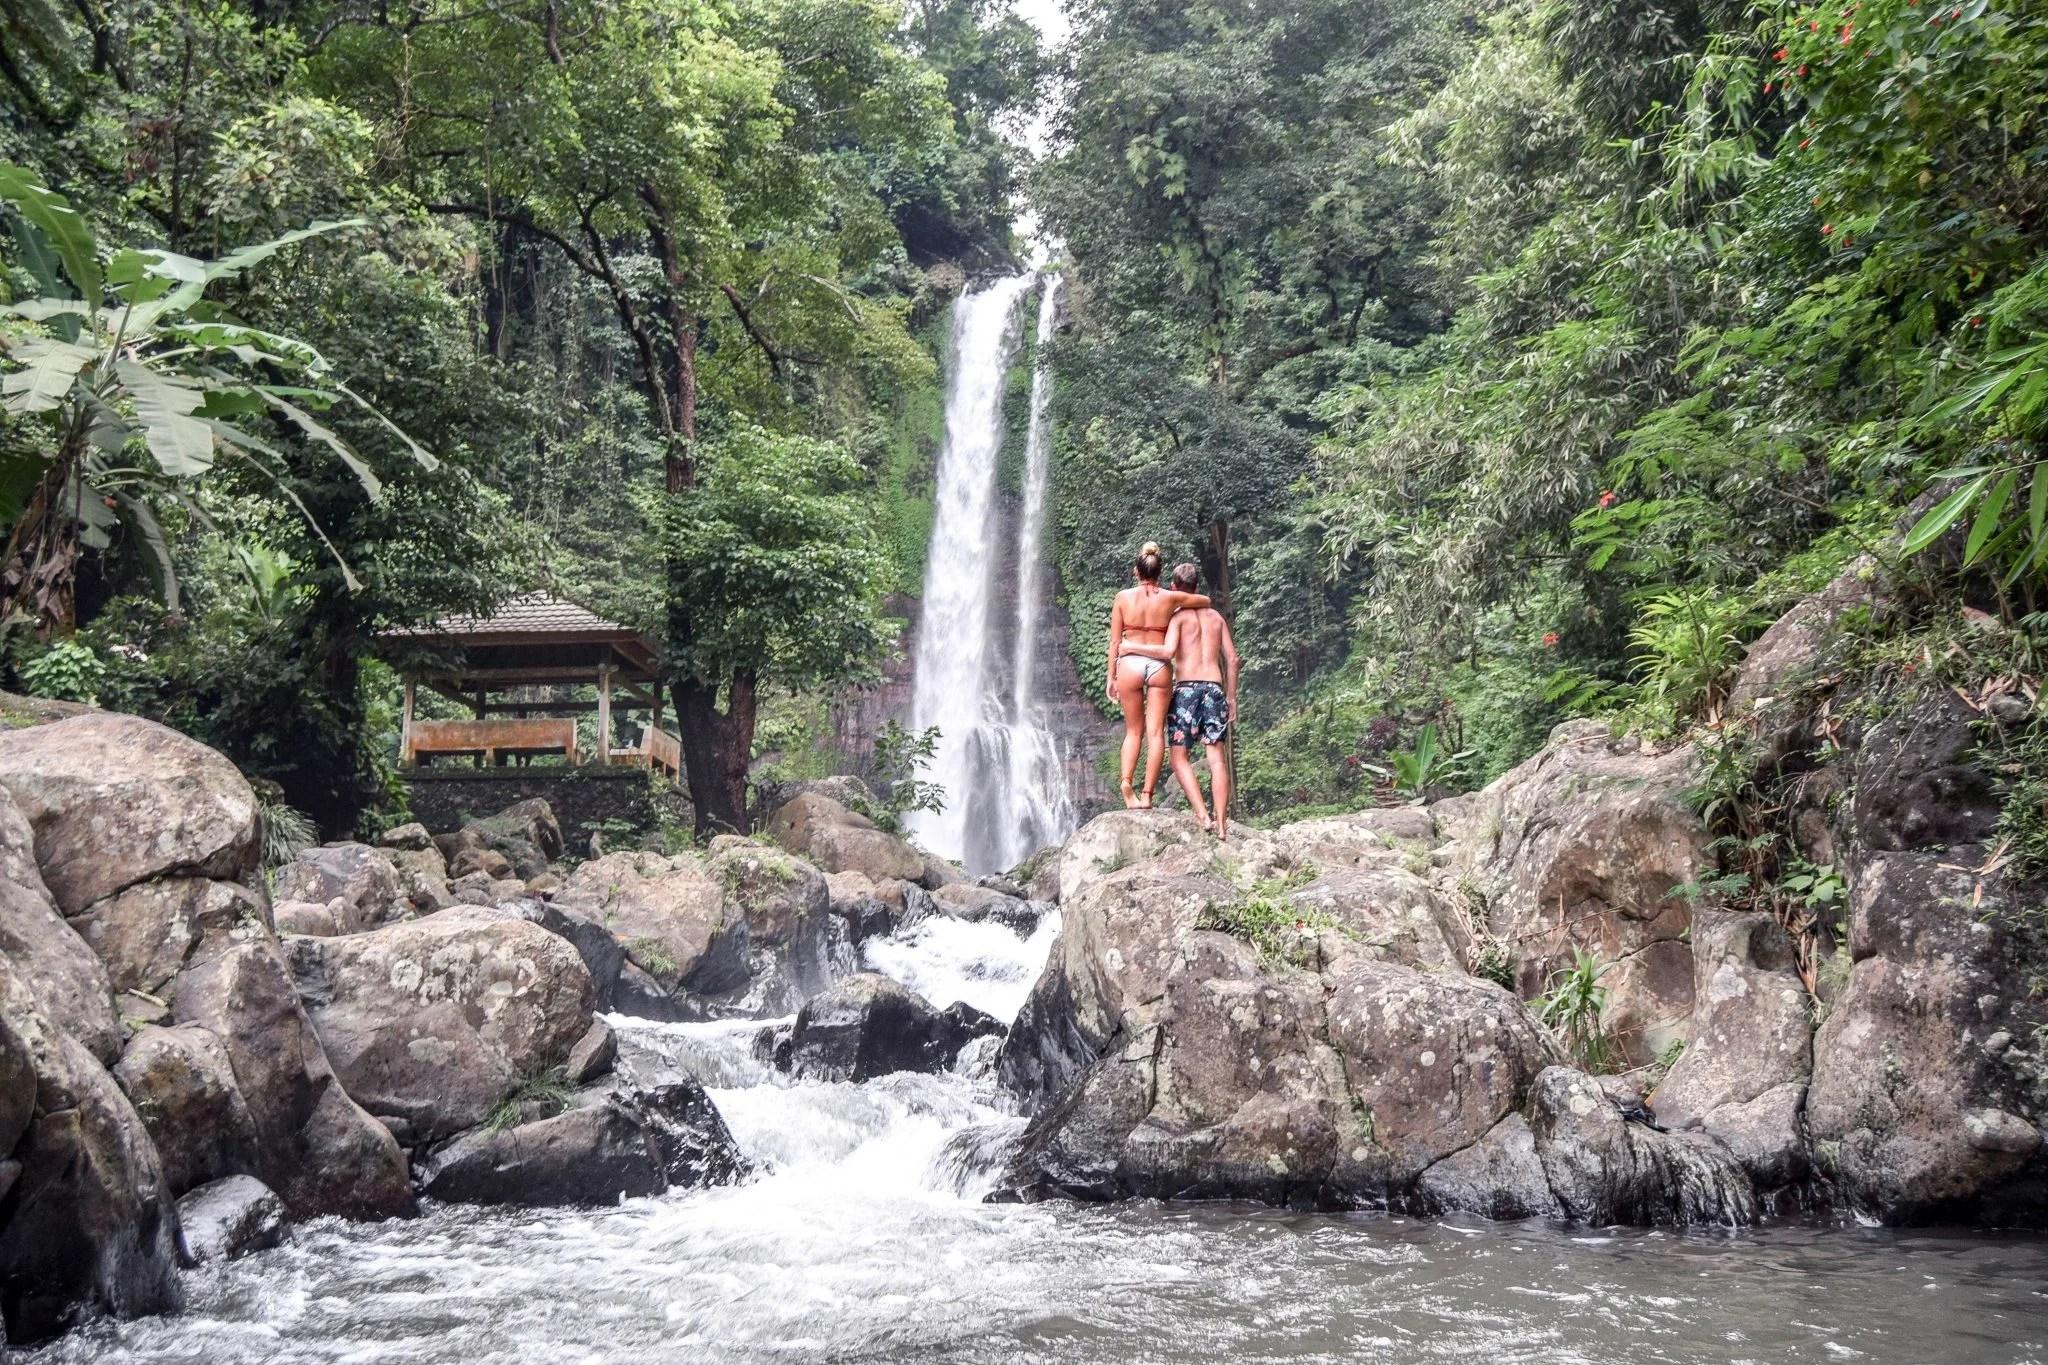 Wanderers & Warriors - Charlie & Lauren UK Travel Couple - Git Git Waterfall Bali - A Northern Treasure - Best Bali Waterfalls - Best Waterfalls In Bali - Northern Bali